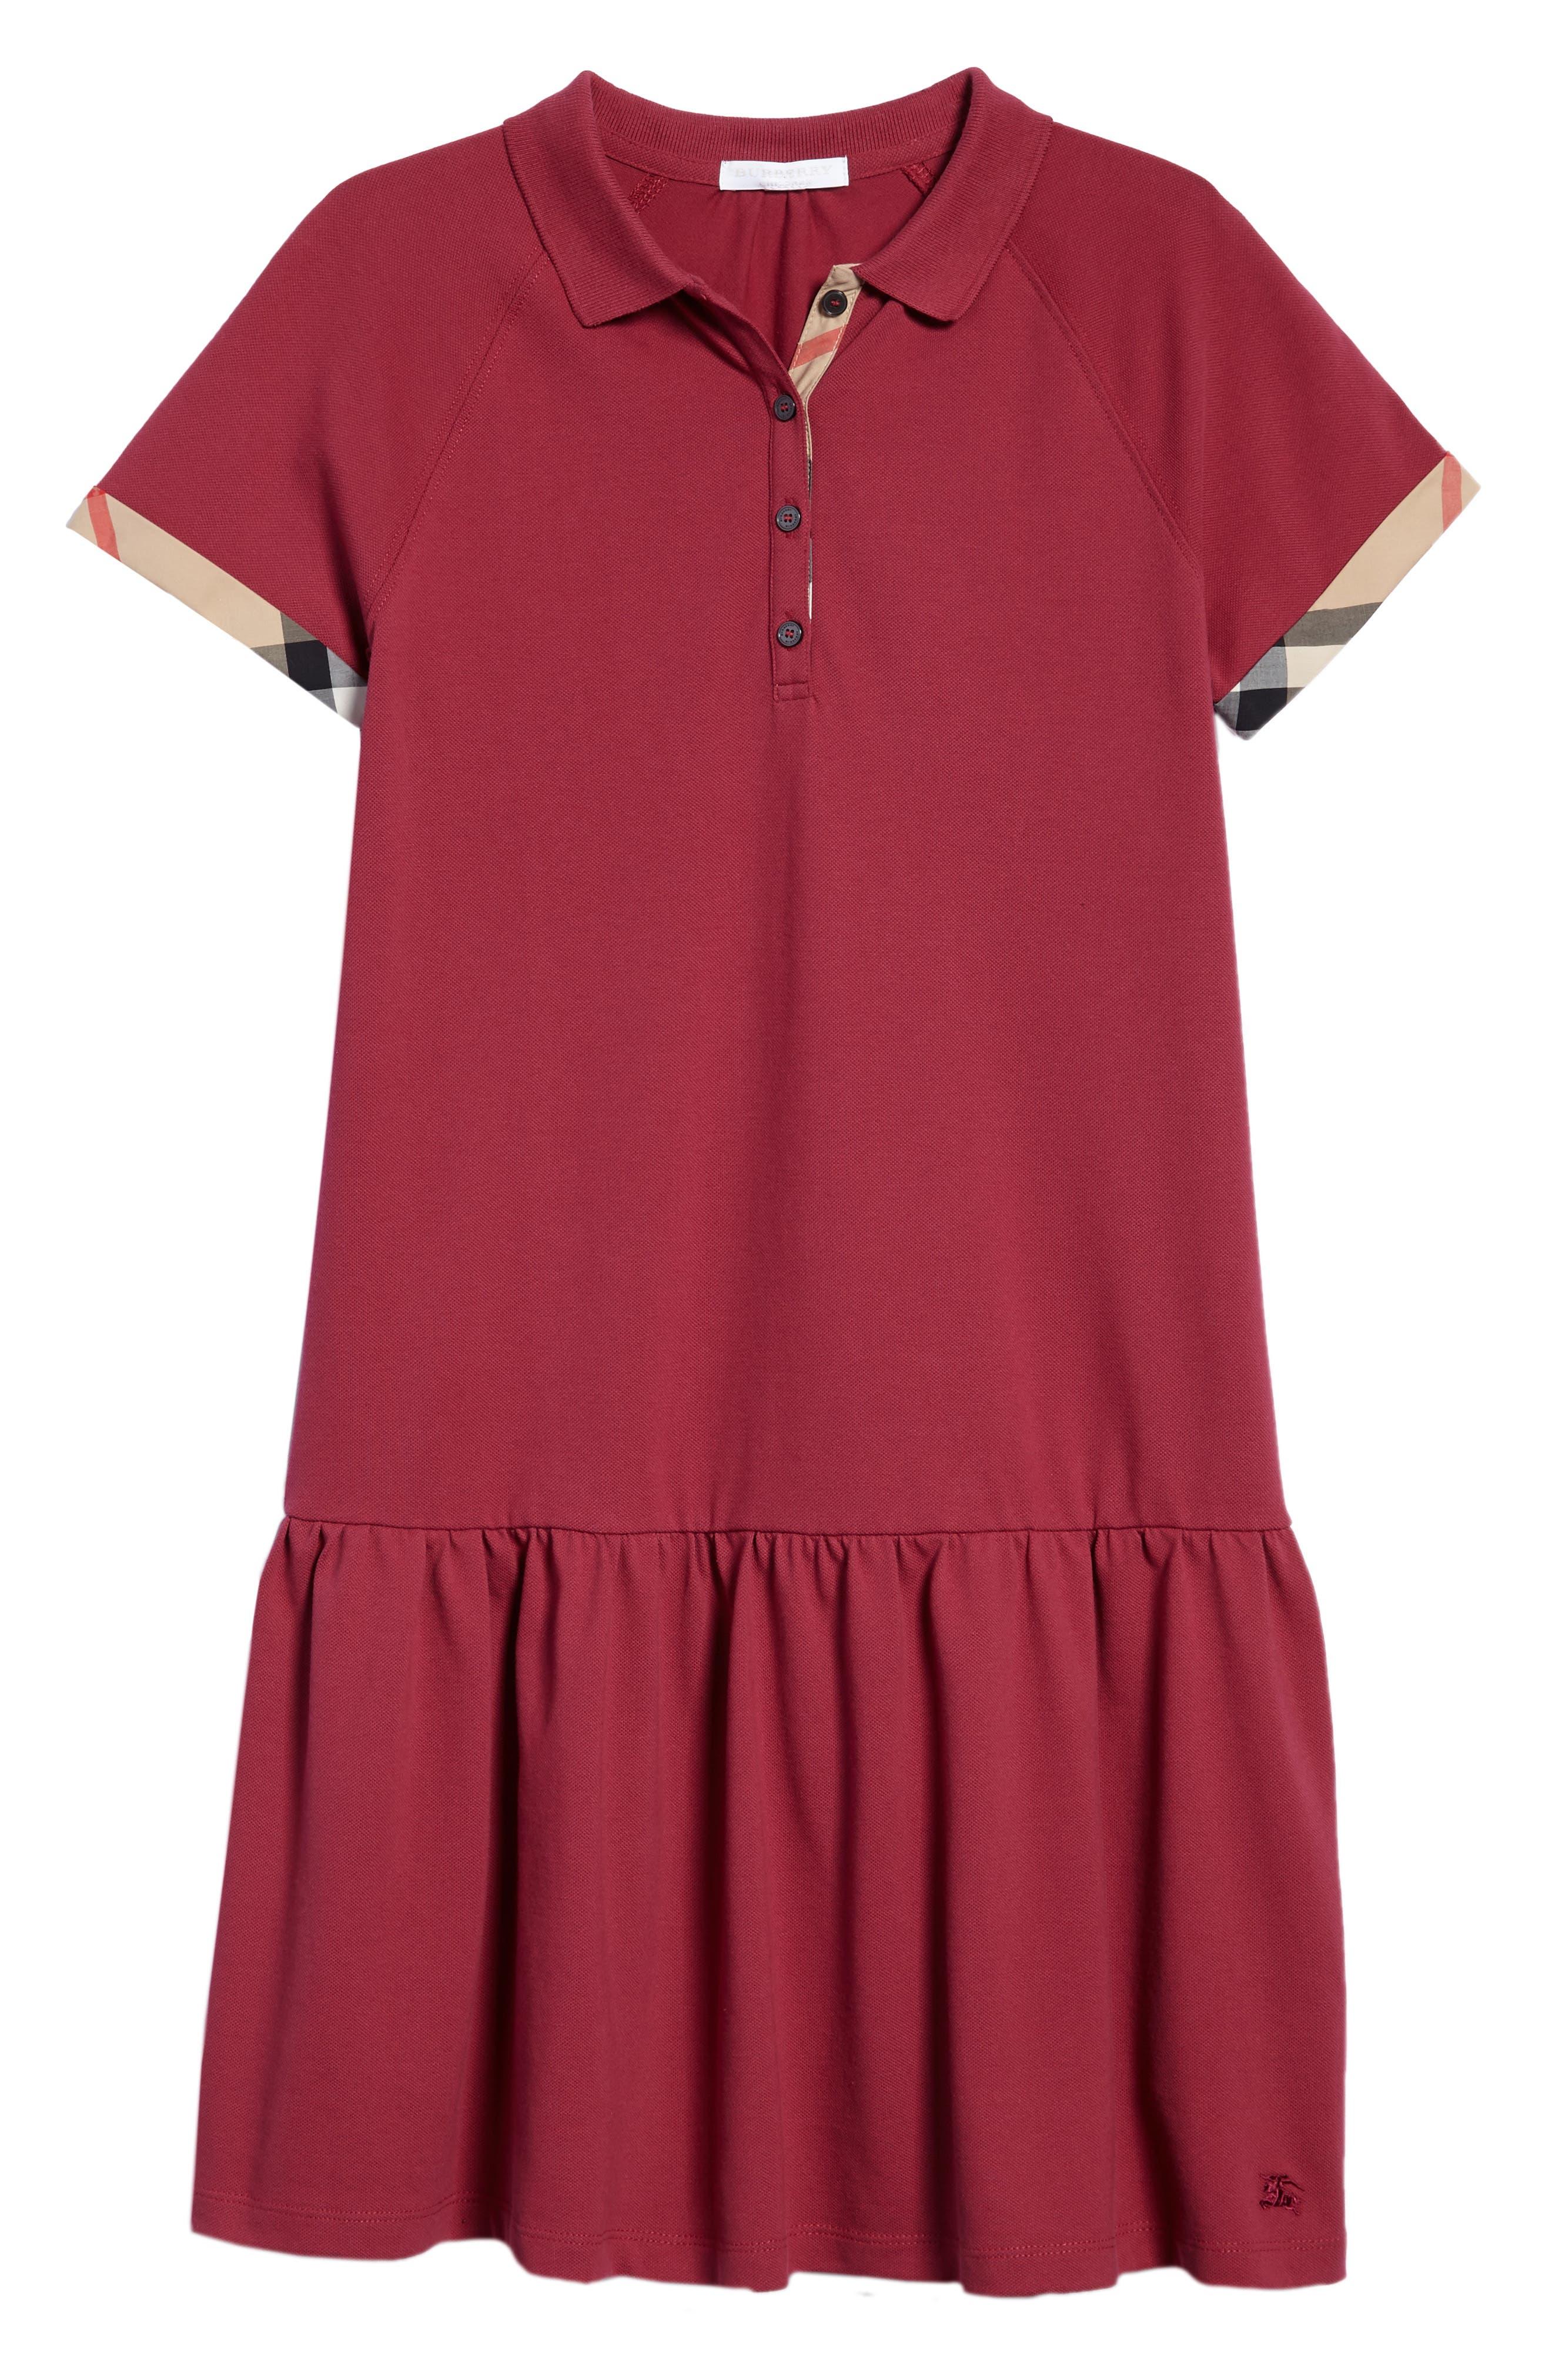 Alternate Image 1 Selected - Burberry Cali Polo Dress (Little Girls & Big Girls)